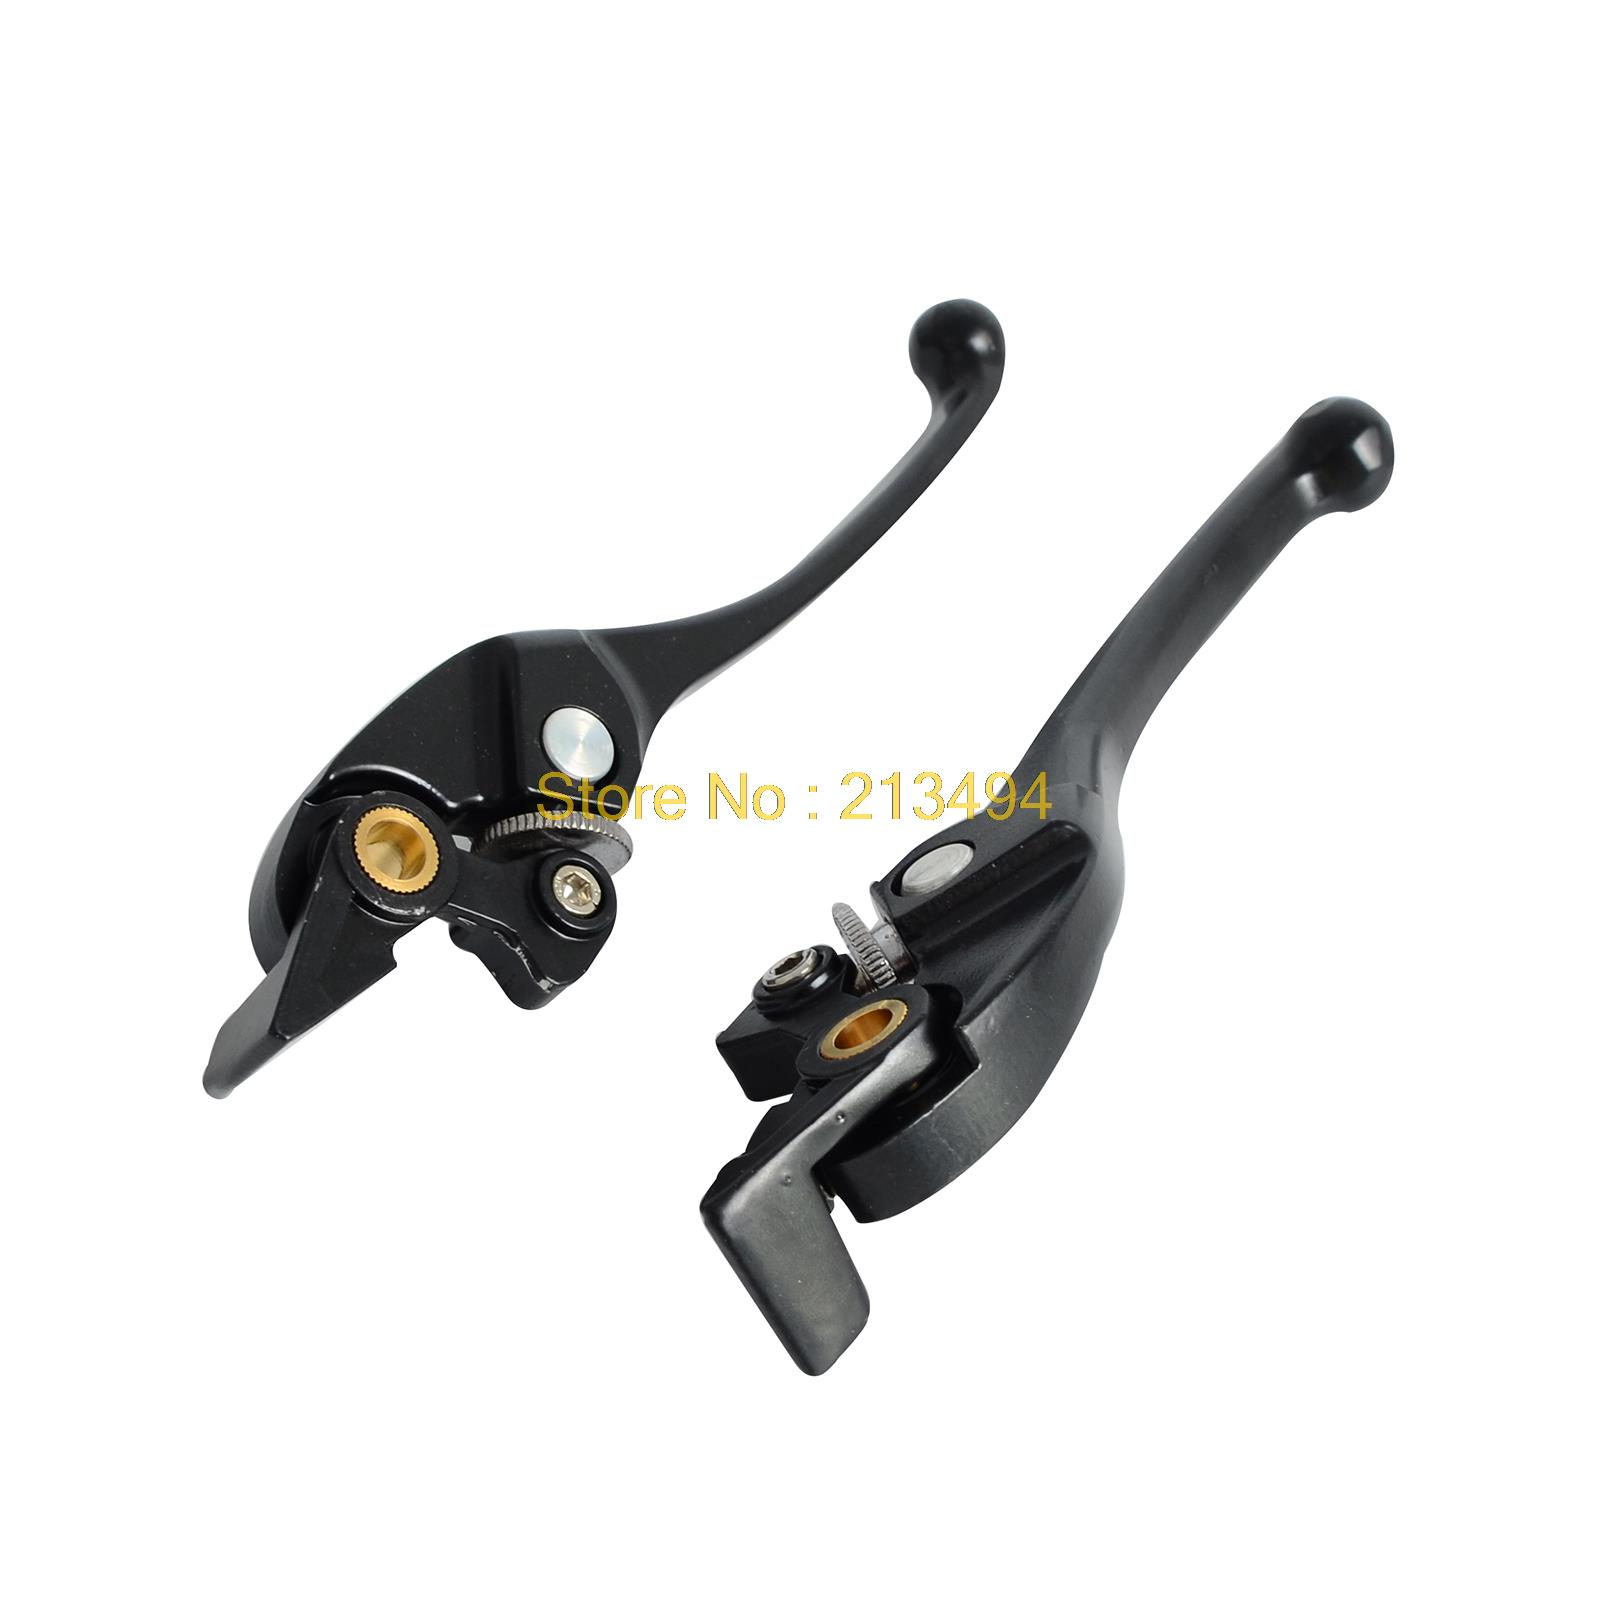 ФОТО Hydraulic Clutch Brake Levers For Suzuki  Marauder 1600 800 Yamaha Road Star Road King 1600 1700